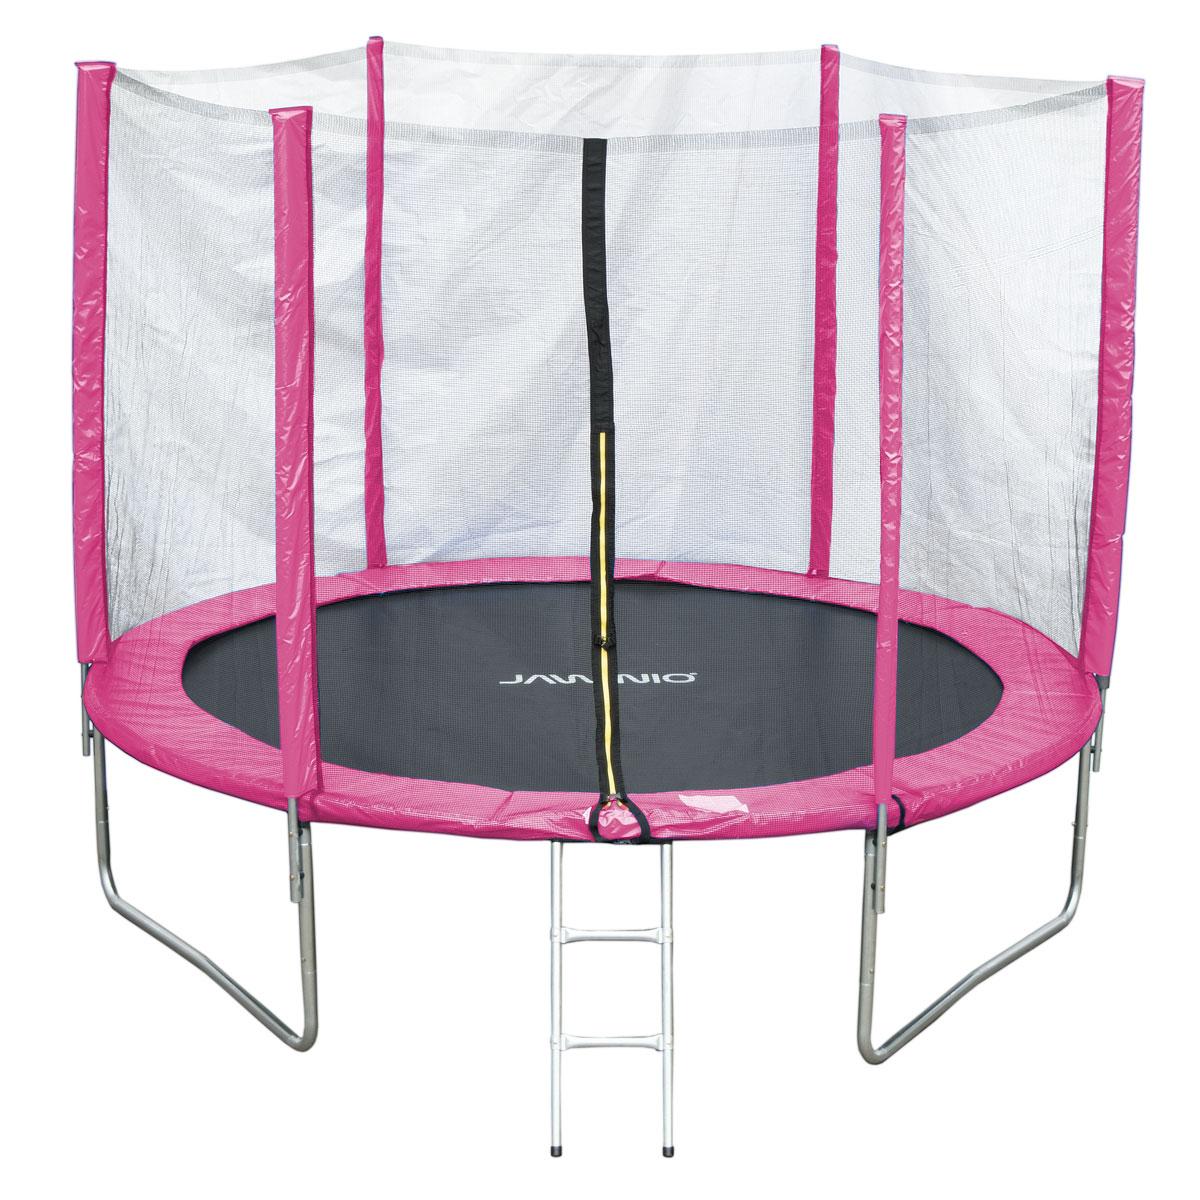 90503 JAWINIO Trampolin 305 cm Gartentrampolin Trampolin Kinder Komplettset Pink